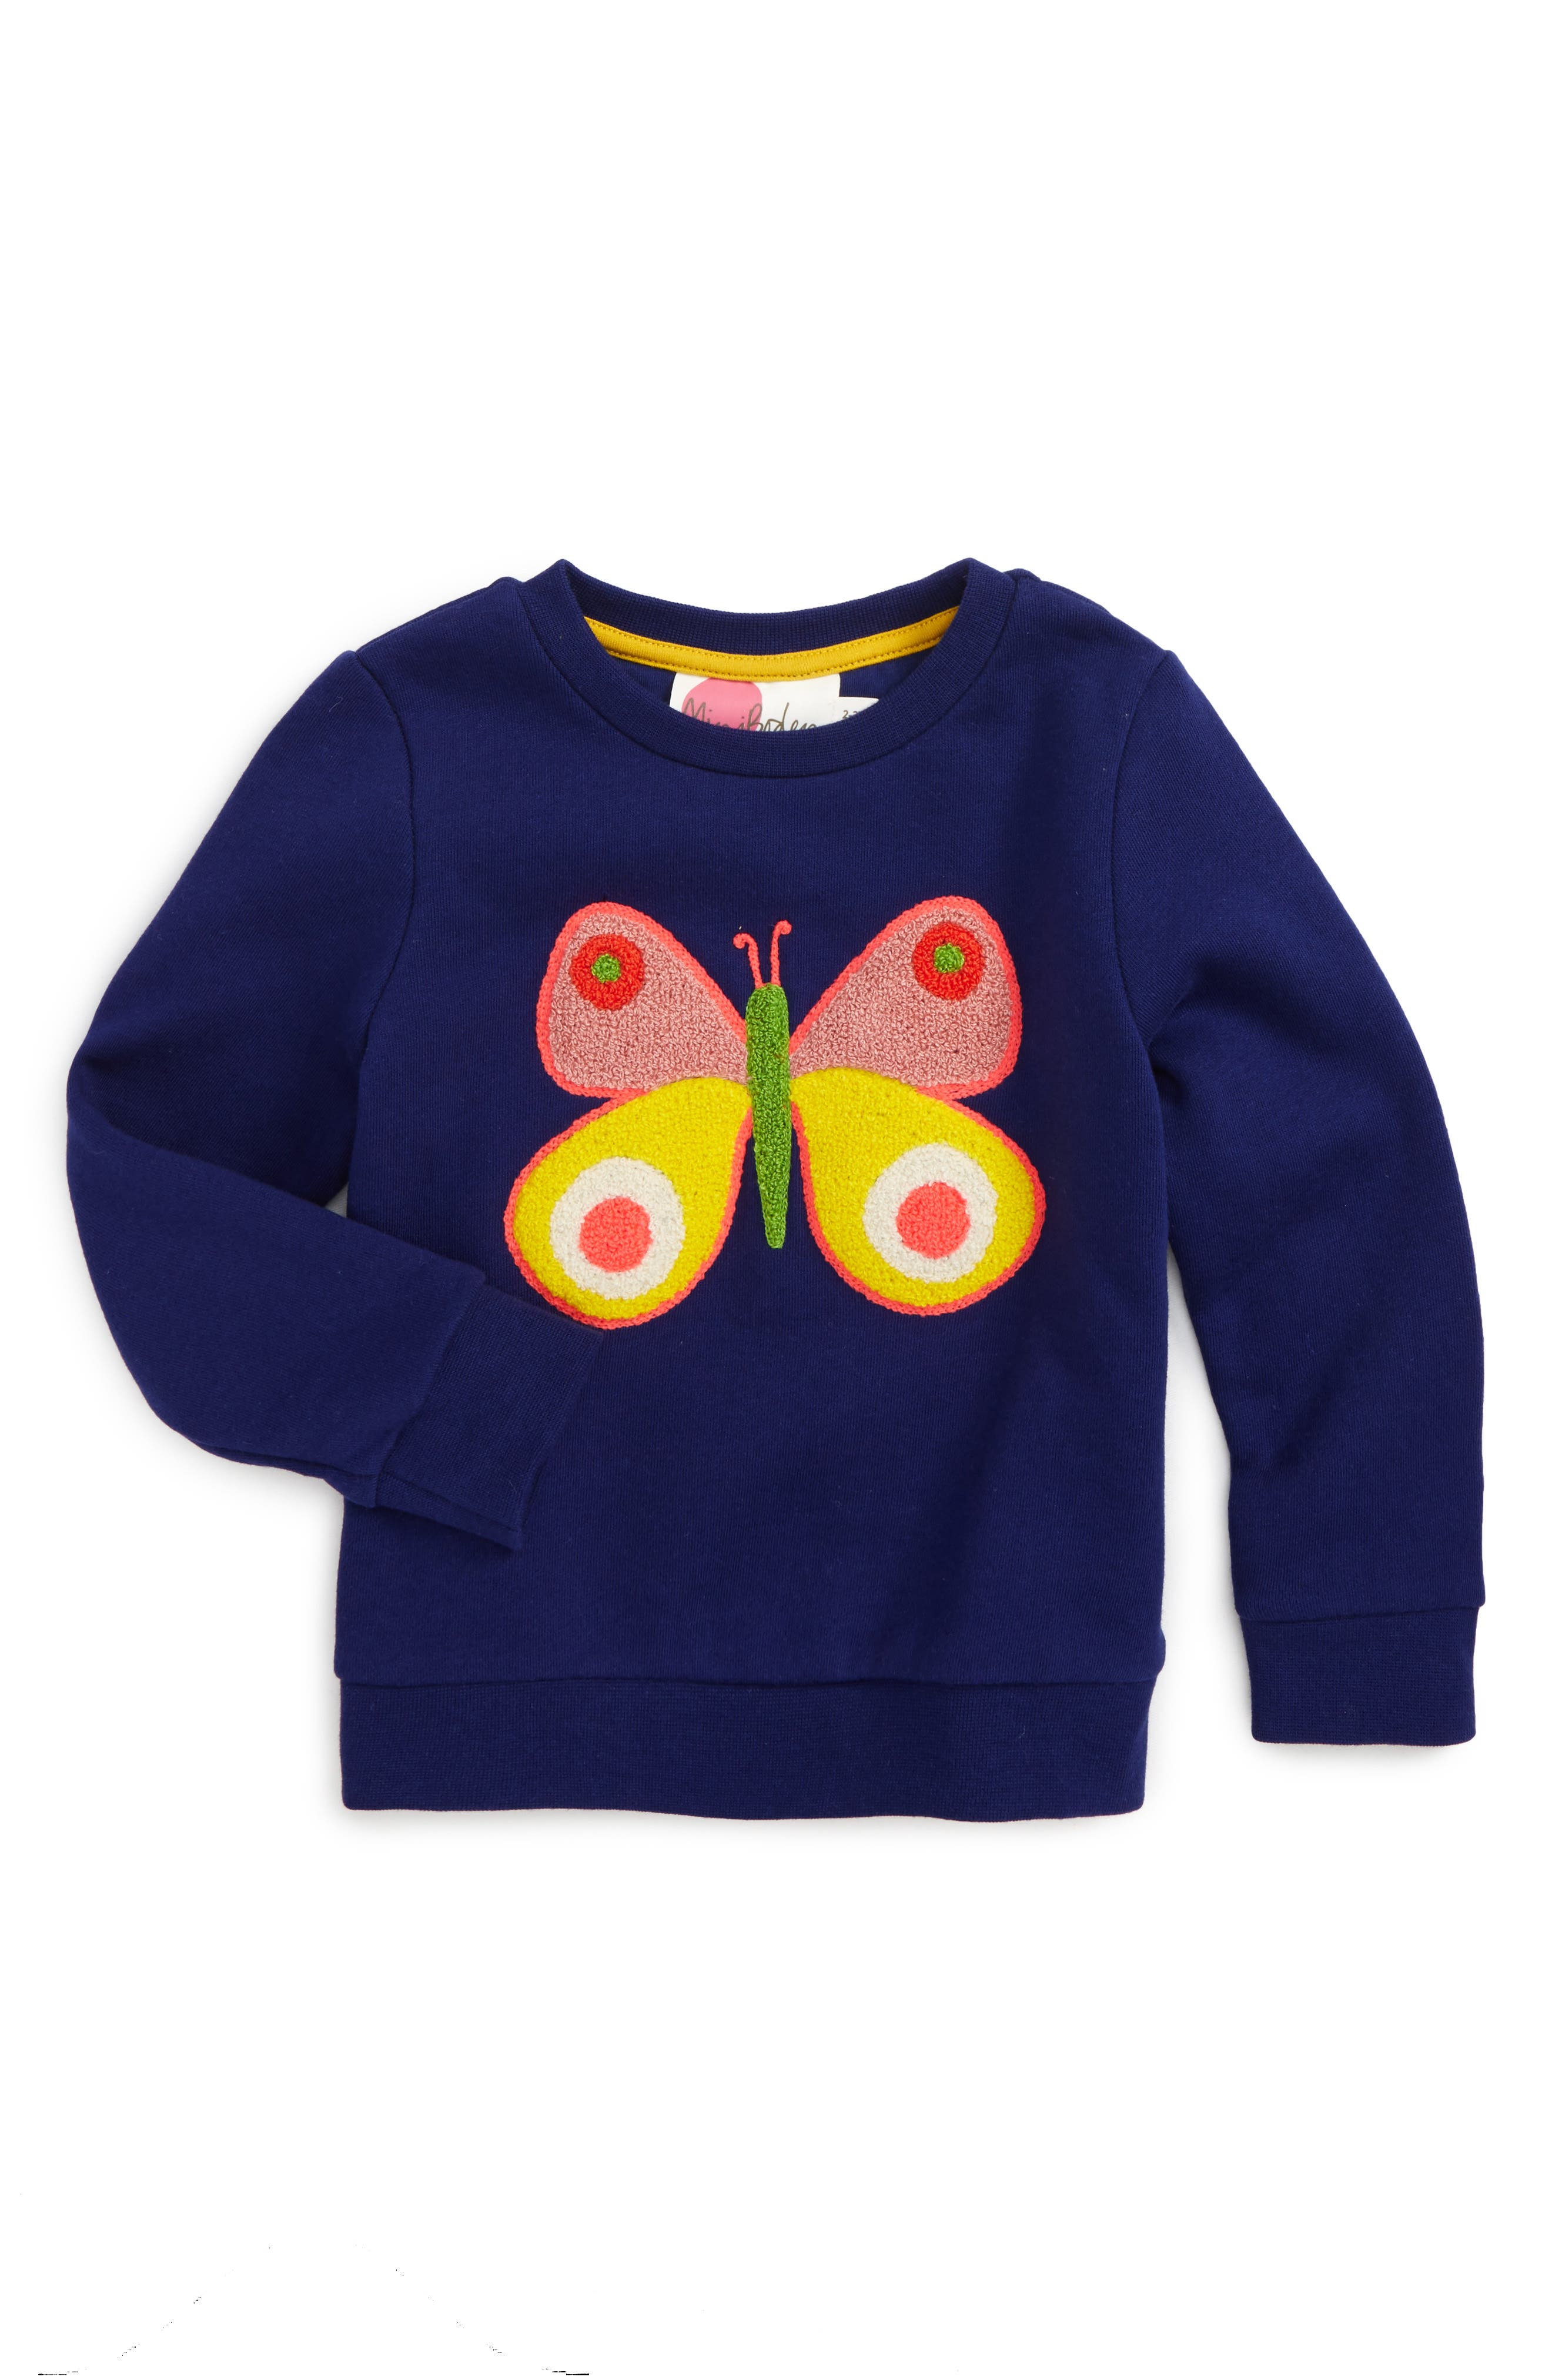 Main Image - Mini Boden Bouclé Embroidered Sweatshirt (Toddler Girls, Little Girls & Big Girls)